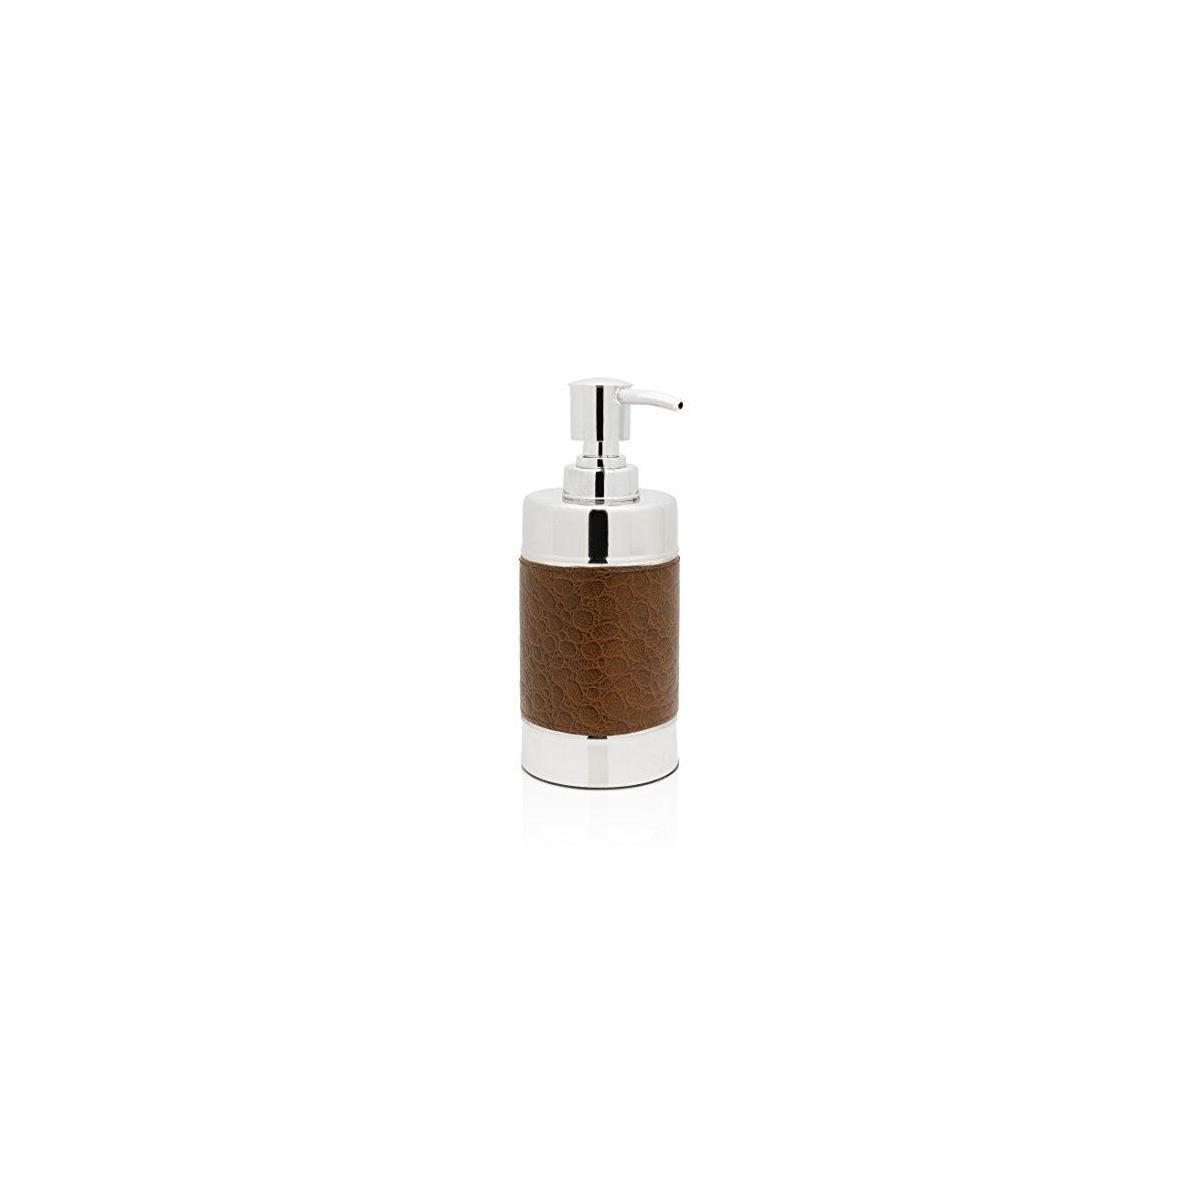 Genuine Leather Stainless Steel Bathroom Soap Dispenser, Brown